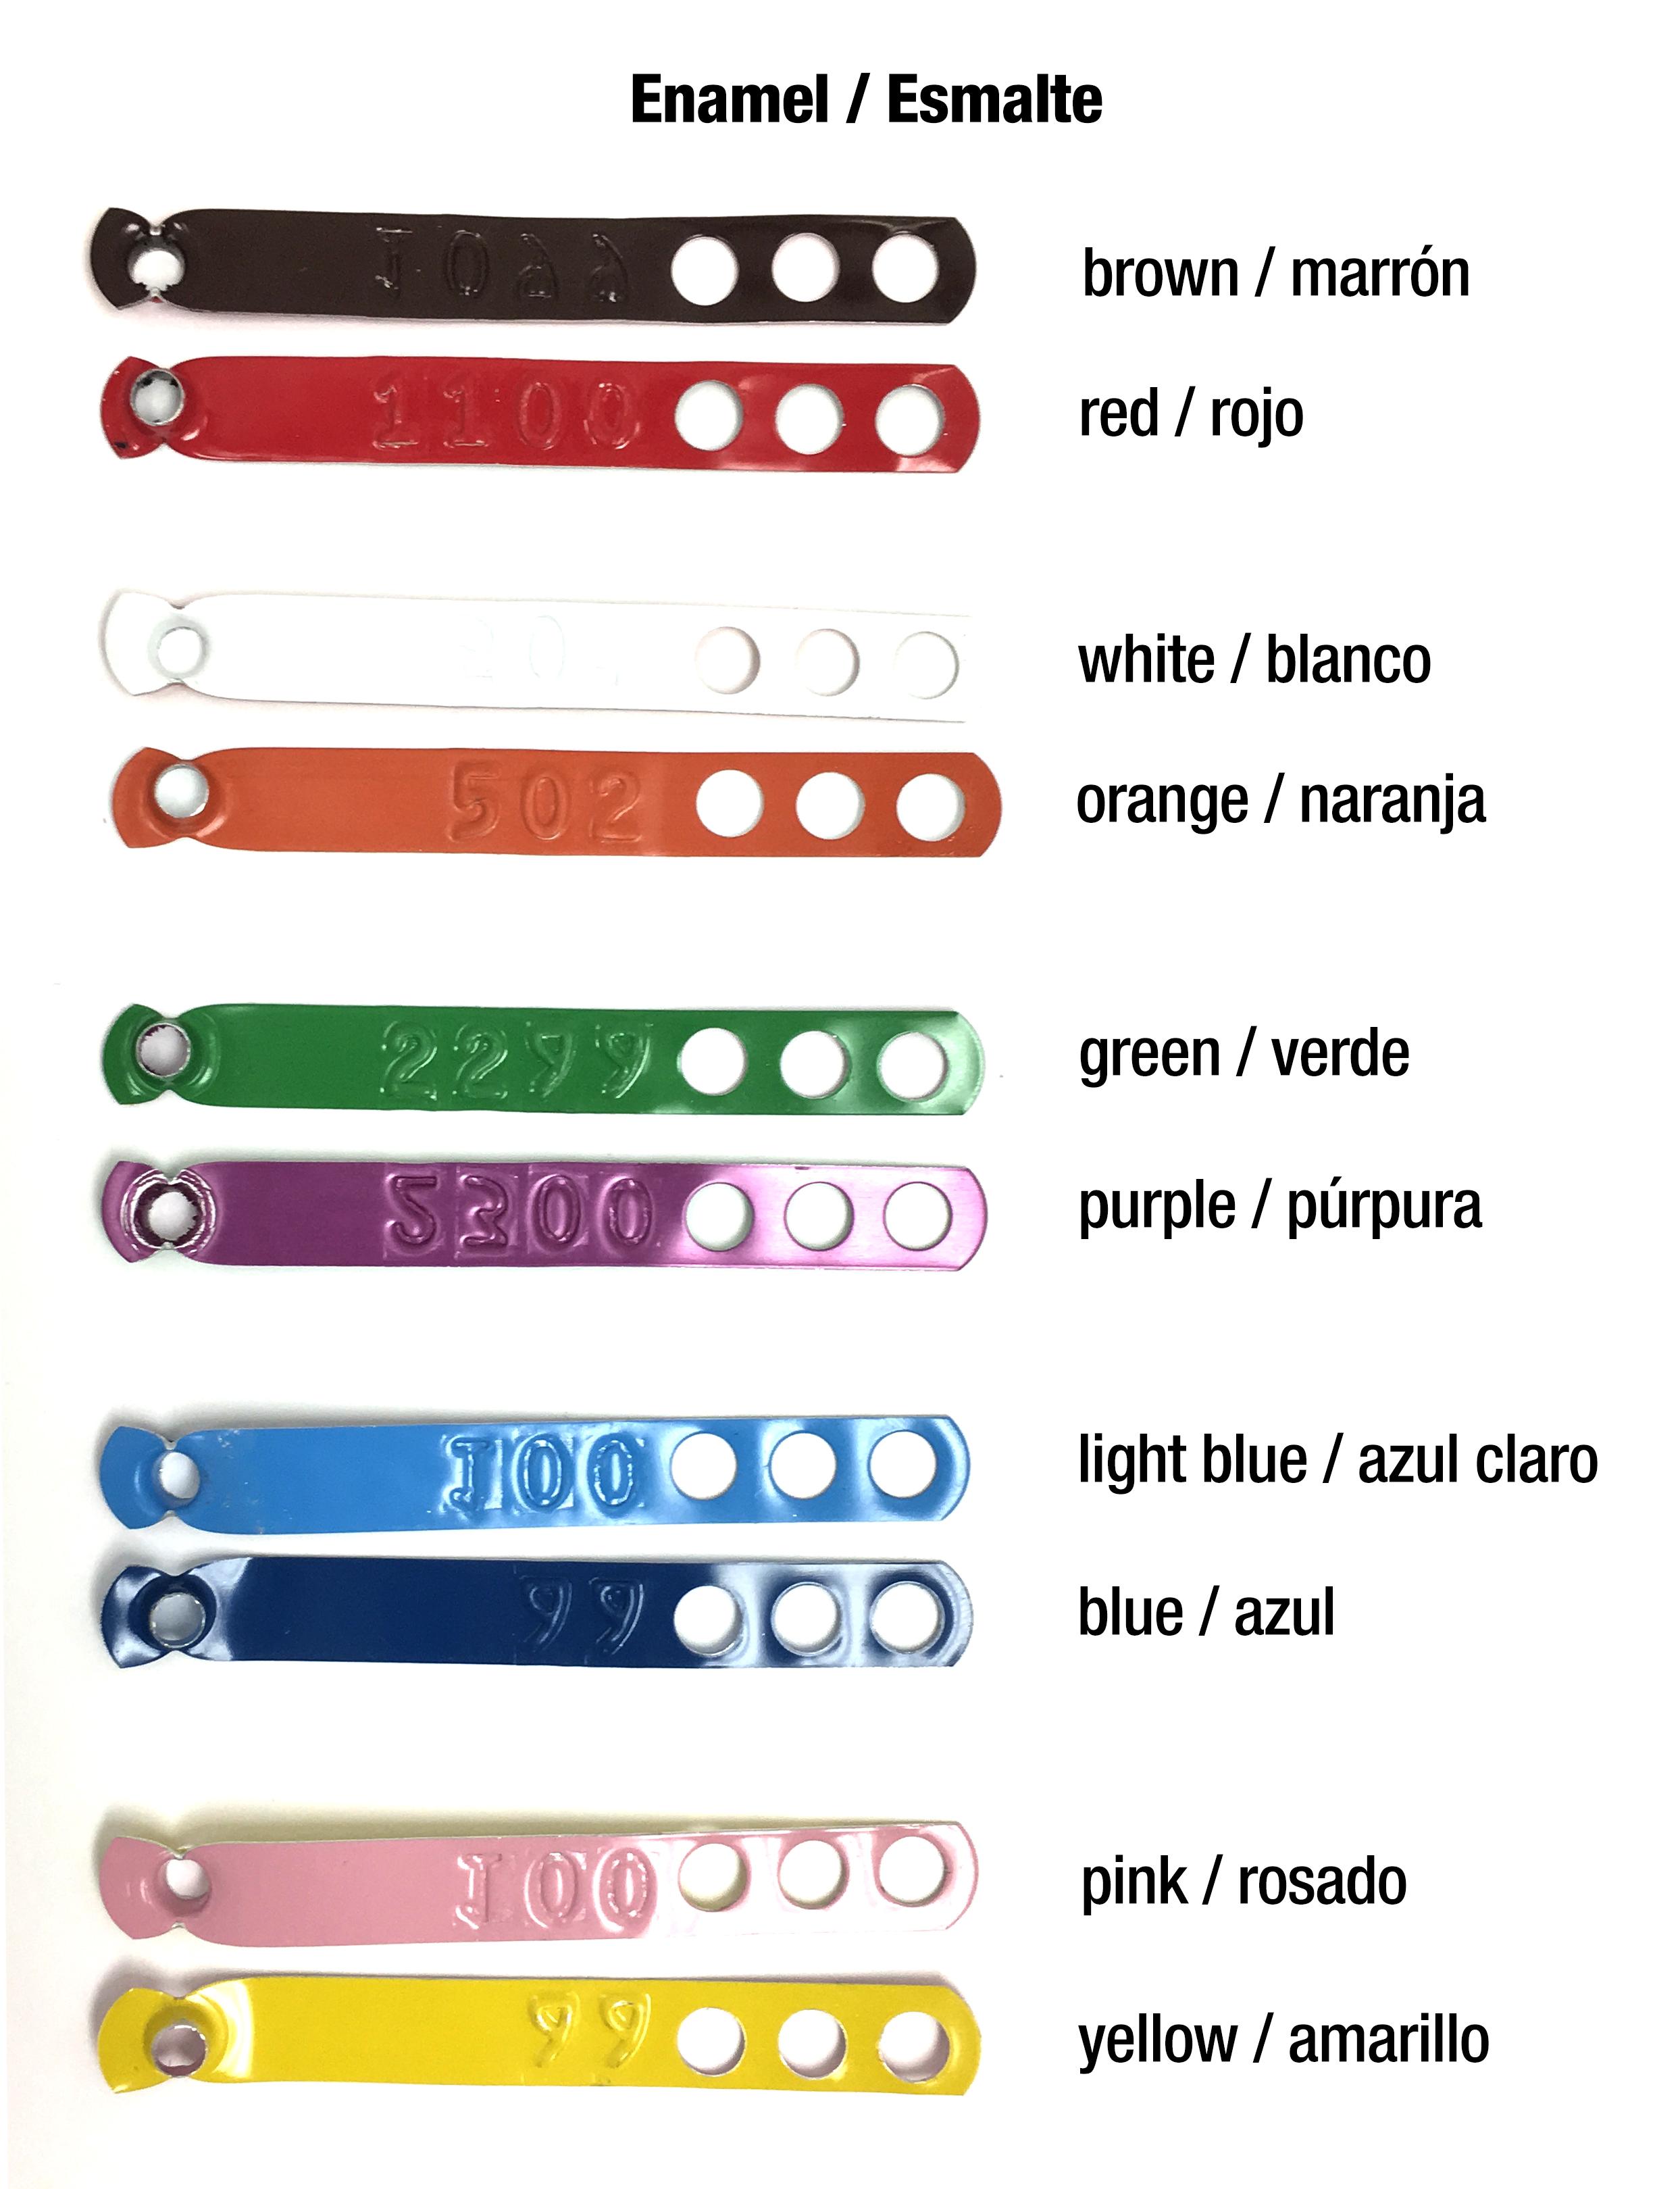 enamel legband colors